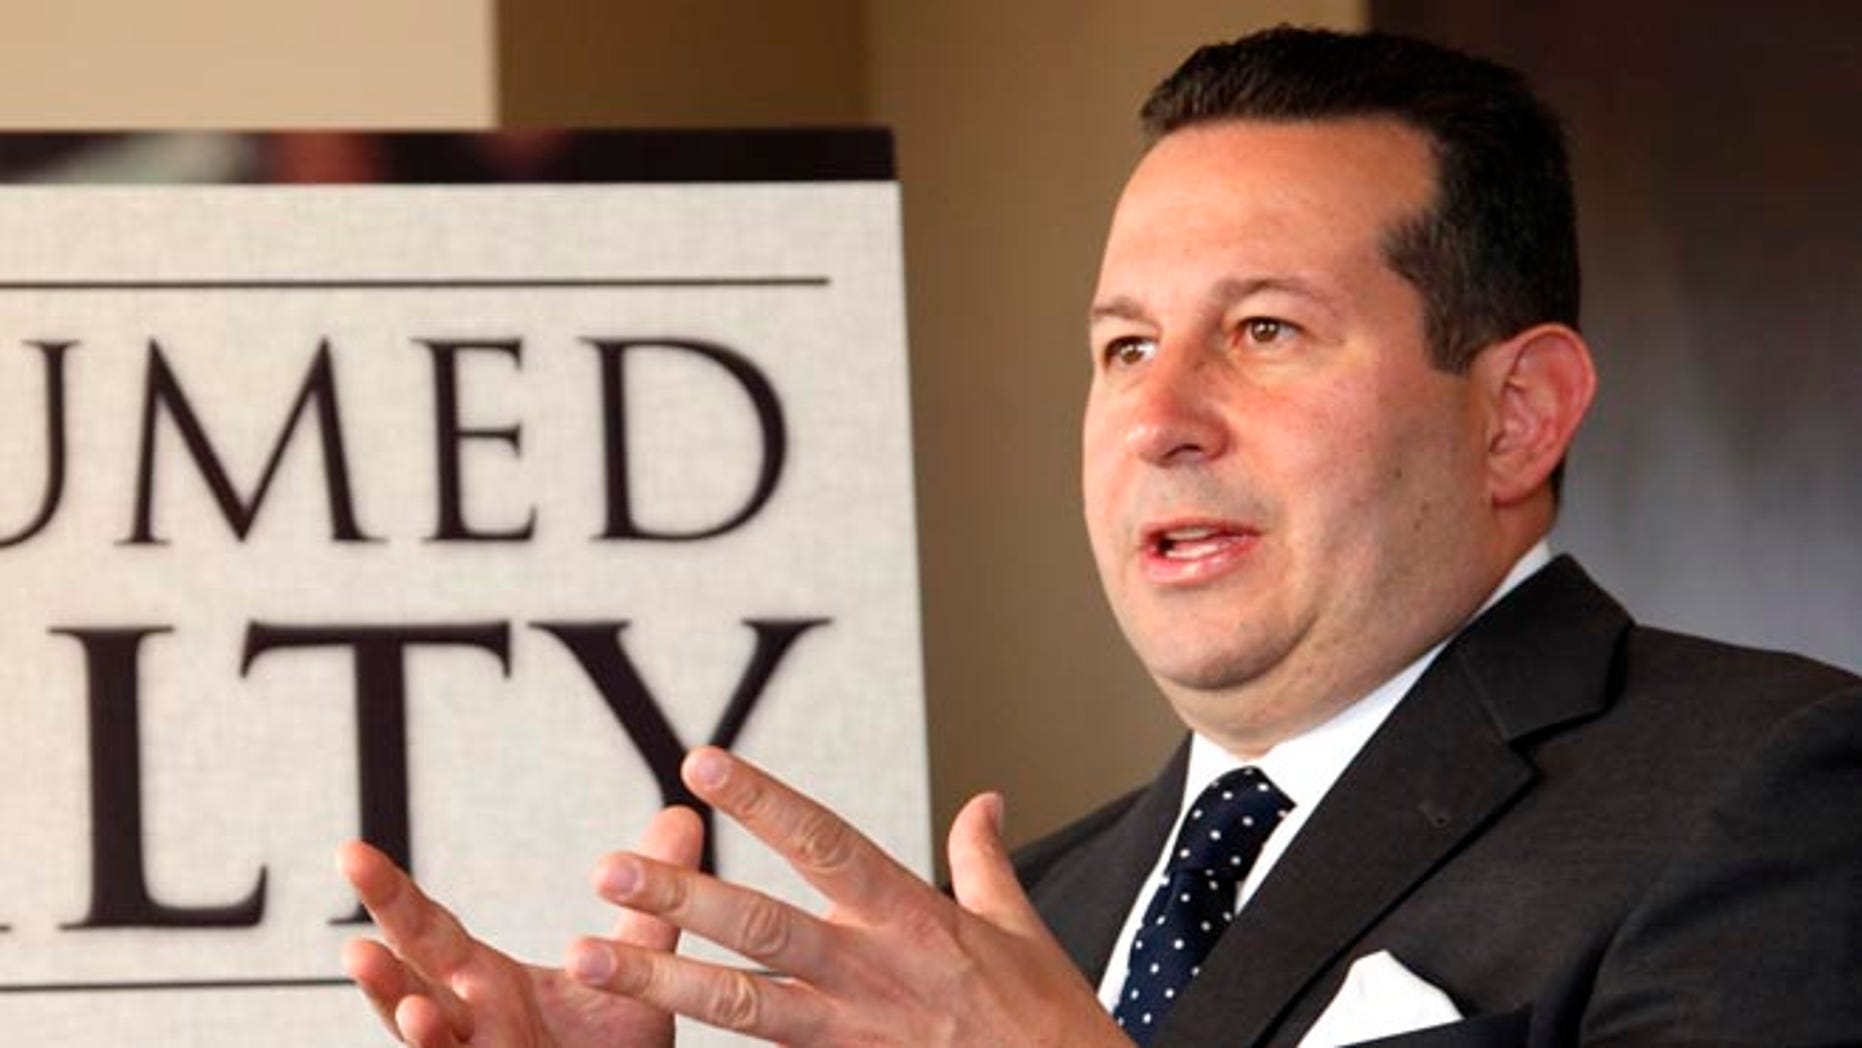 Attorney Jose Baez in a July 3, 2012 file photo.